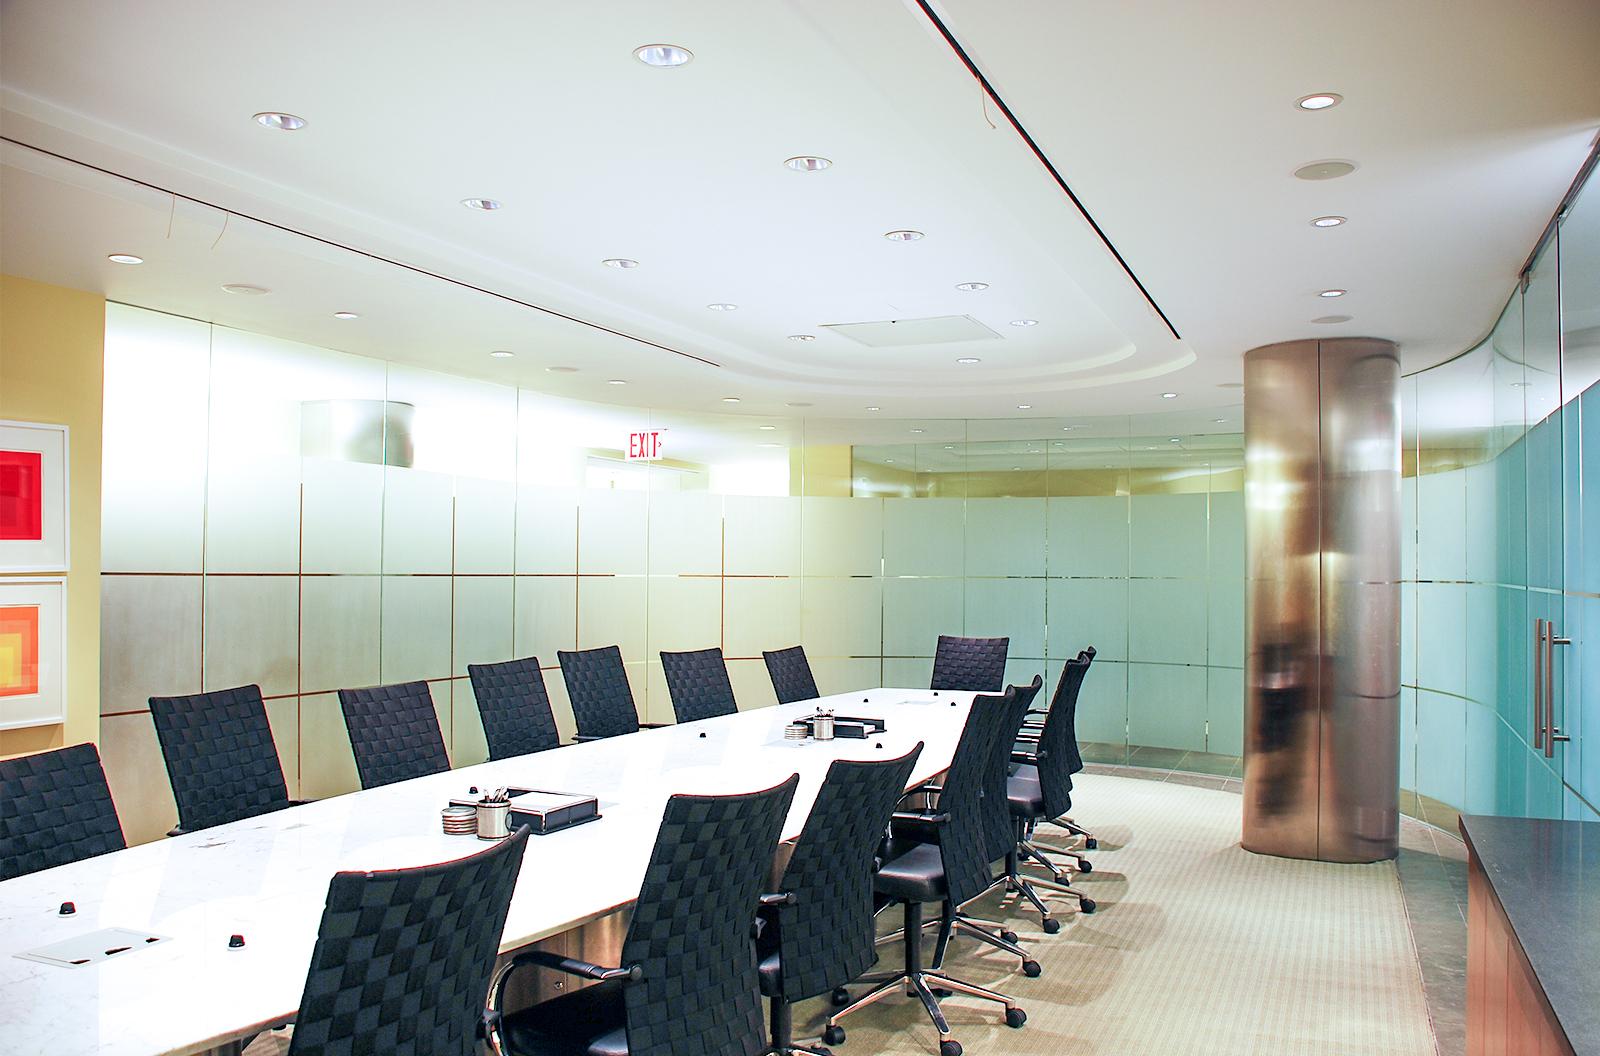 Corporate Mandarina Studio office interior design 1.jpg